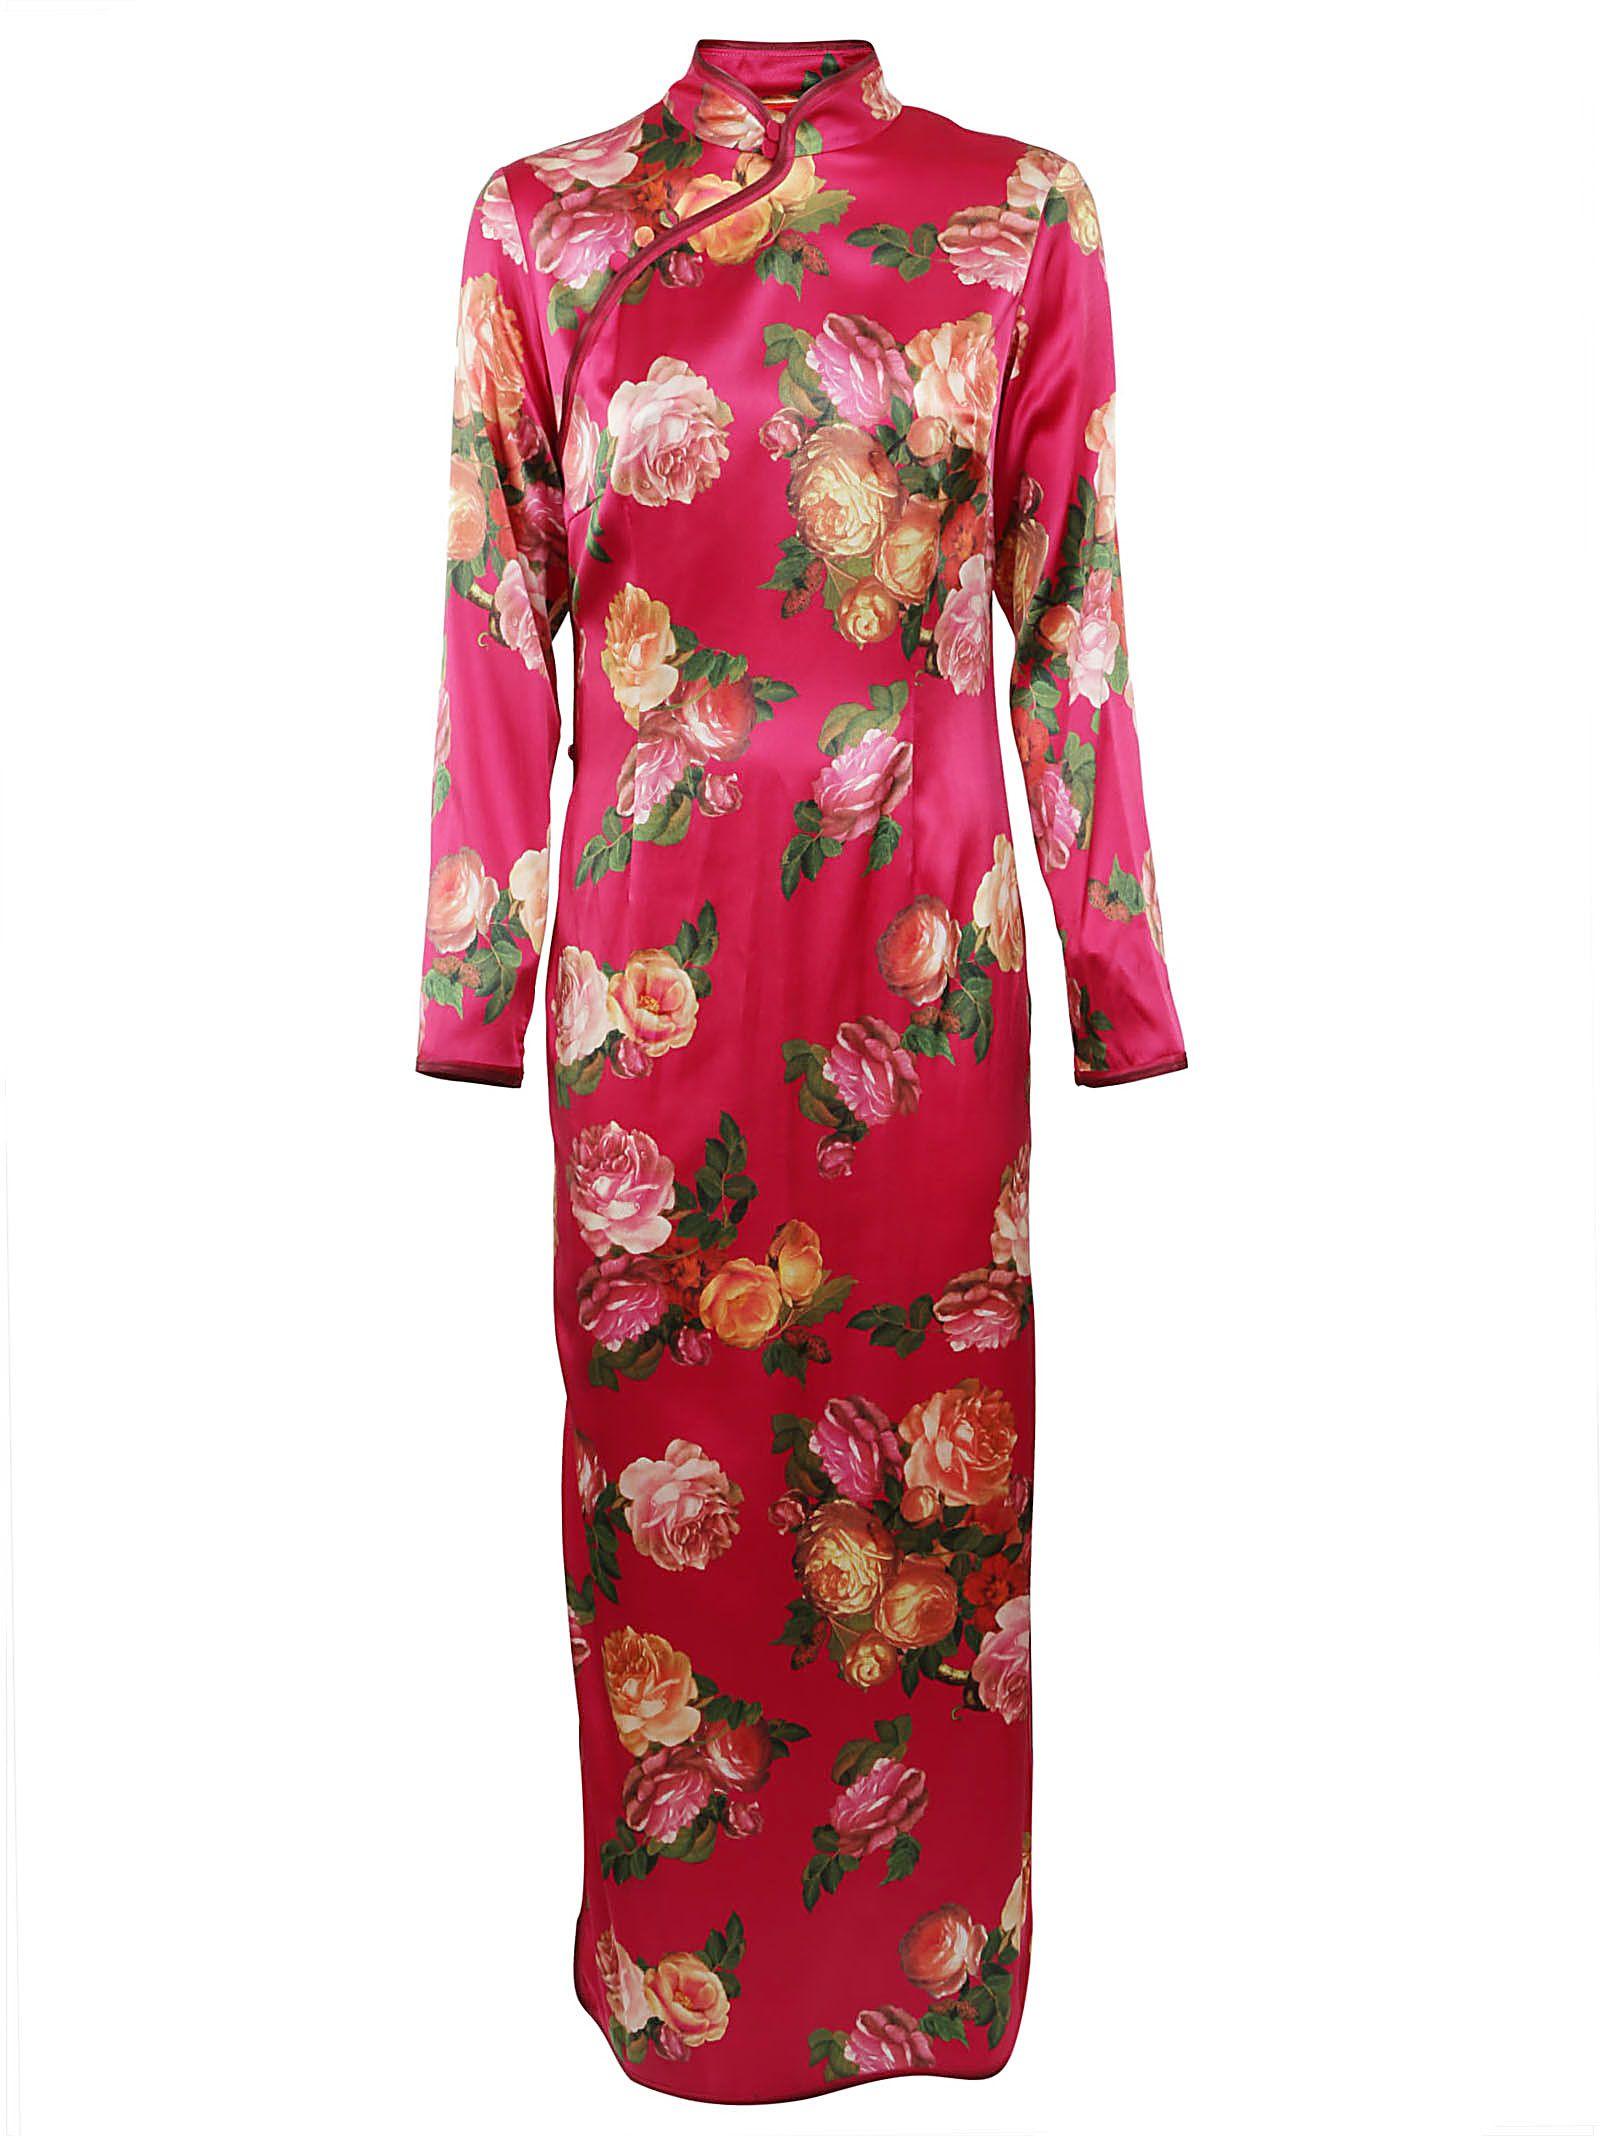 For Restless Sleepers Rose Print Shift Dress